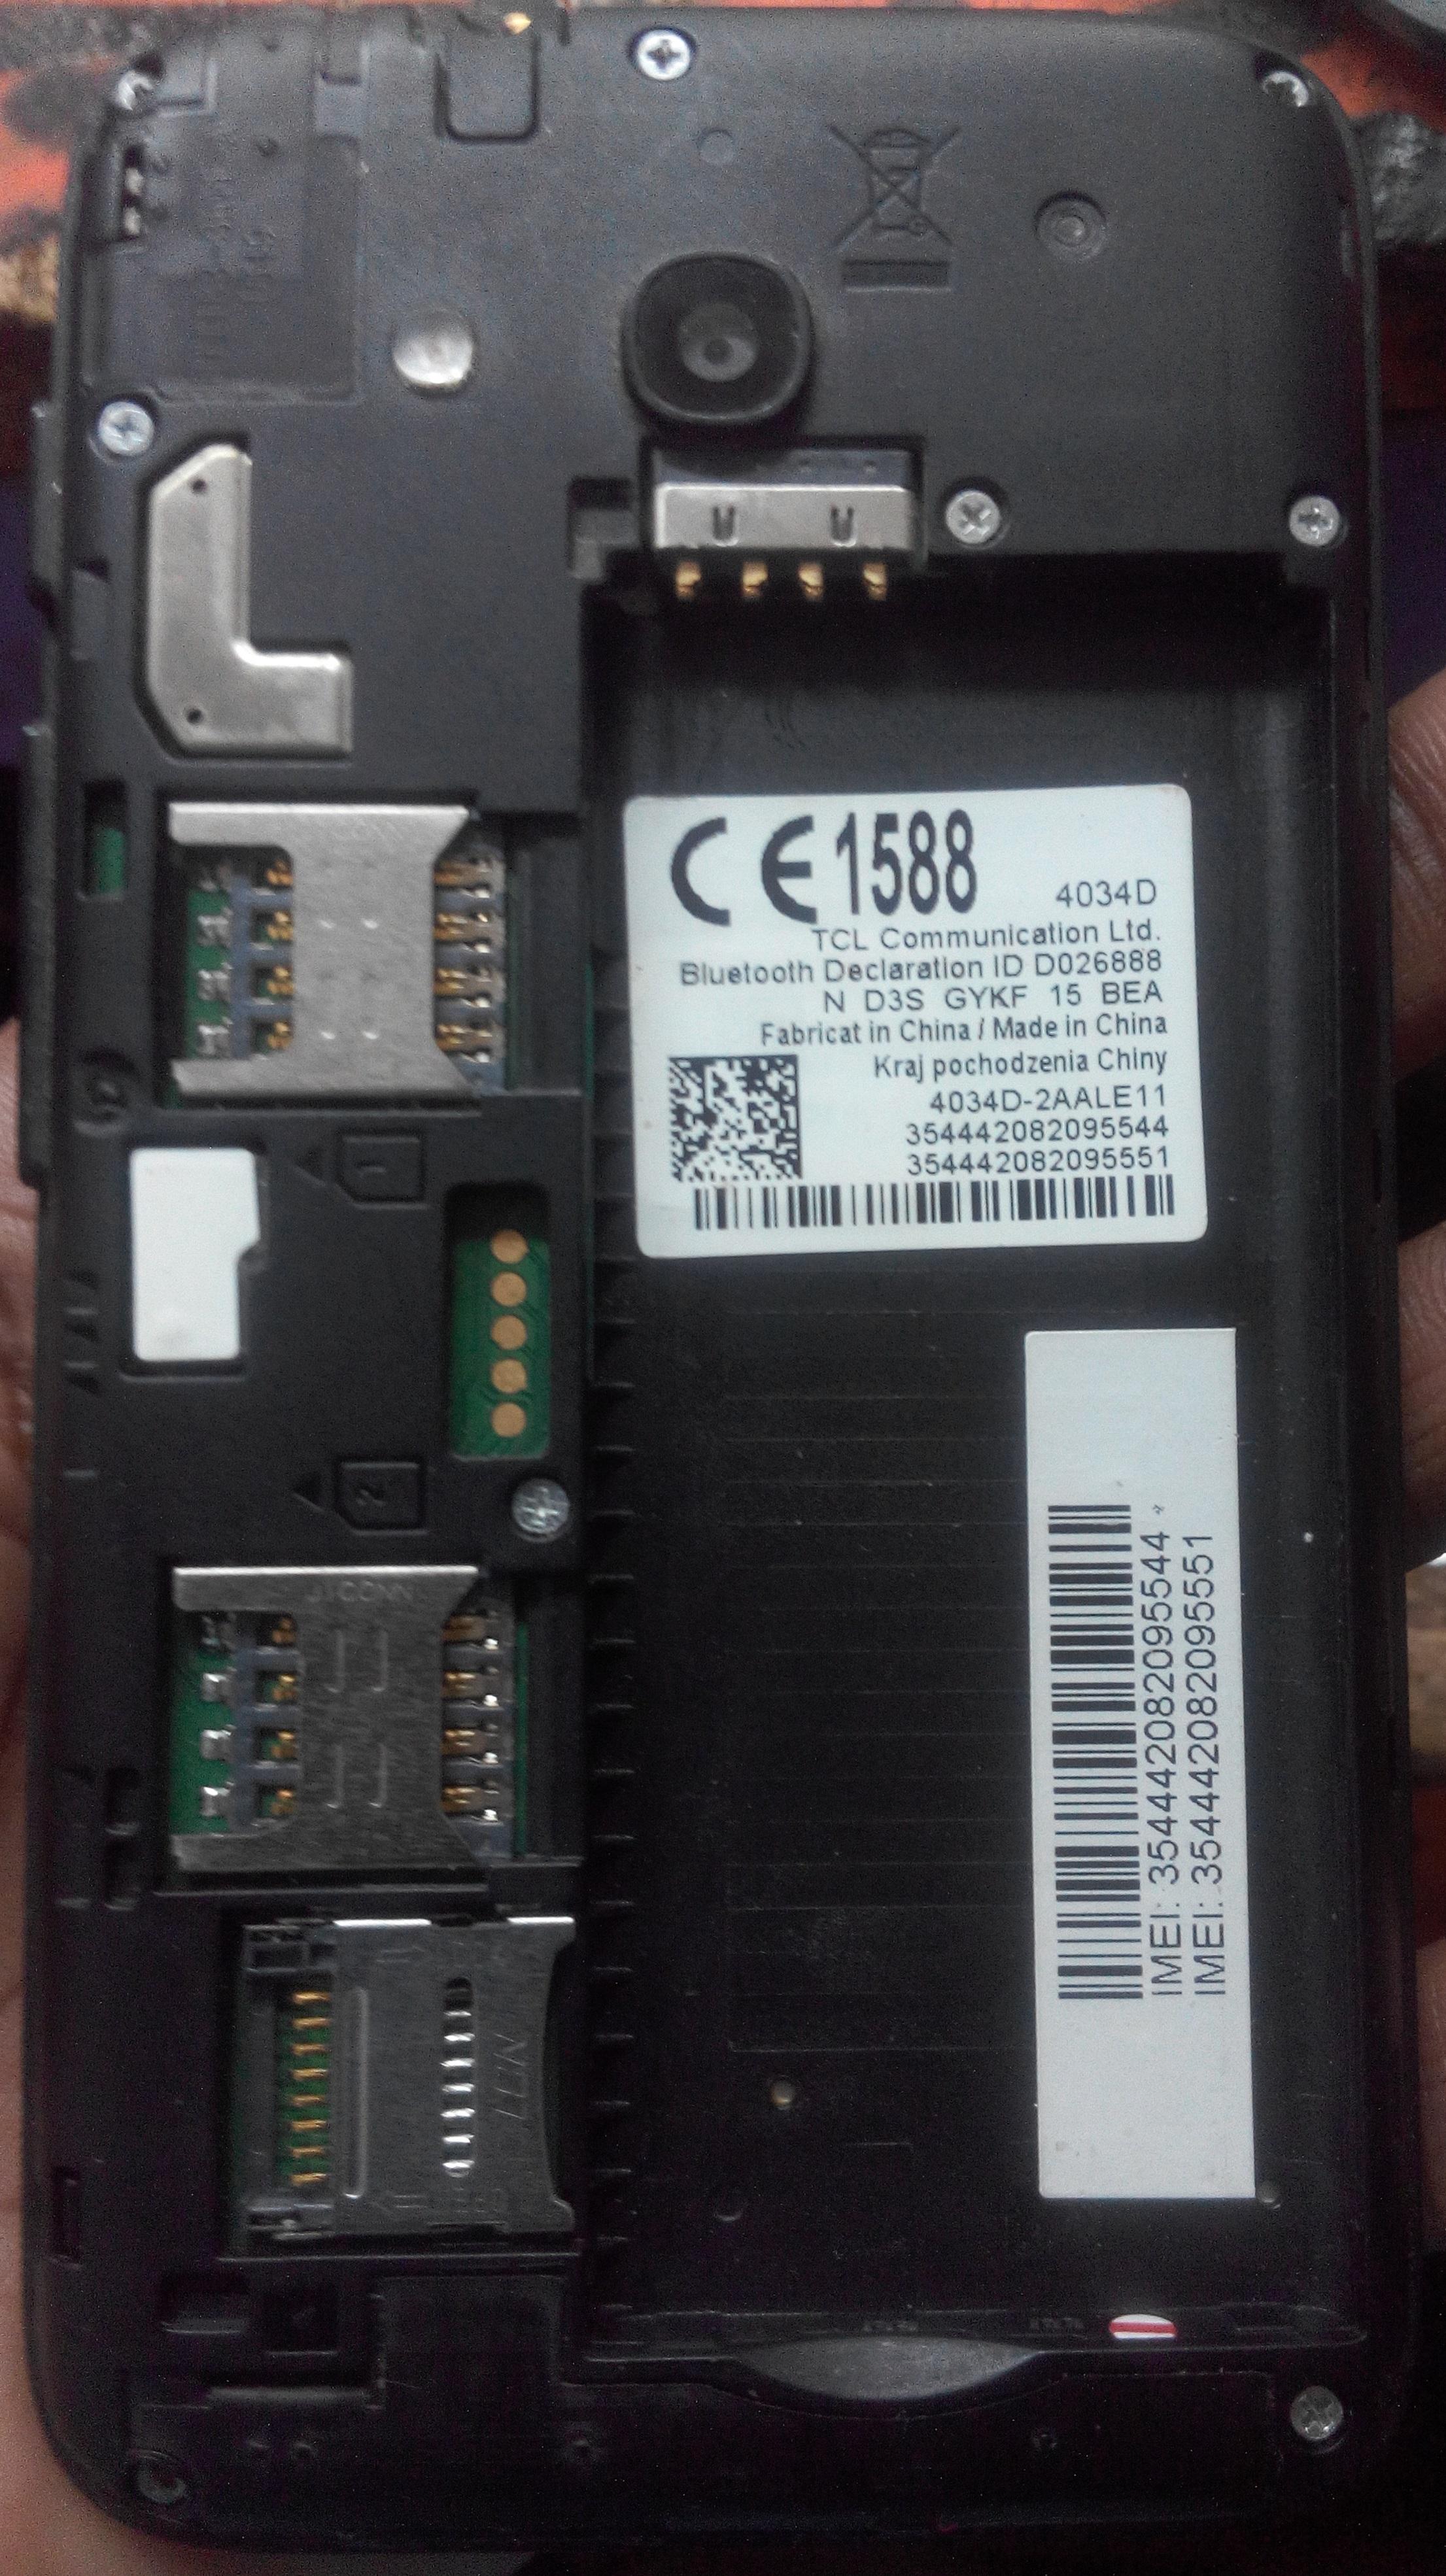 Alcatel 4034D Flash File MT6580 6 0 Firmware | Download